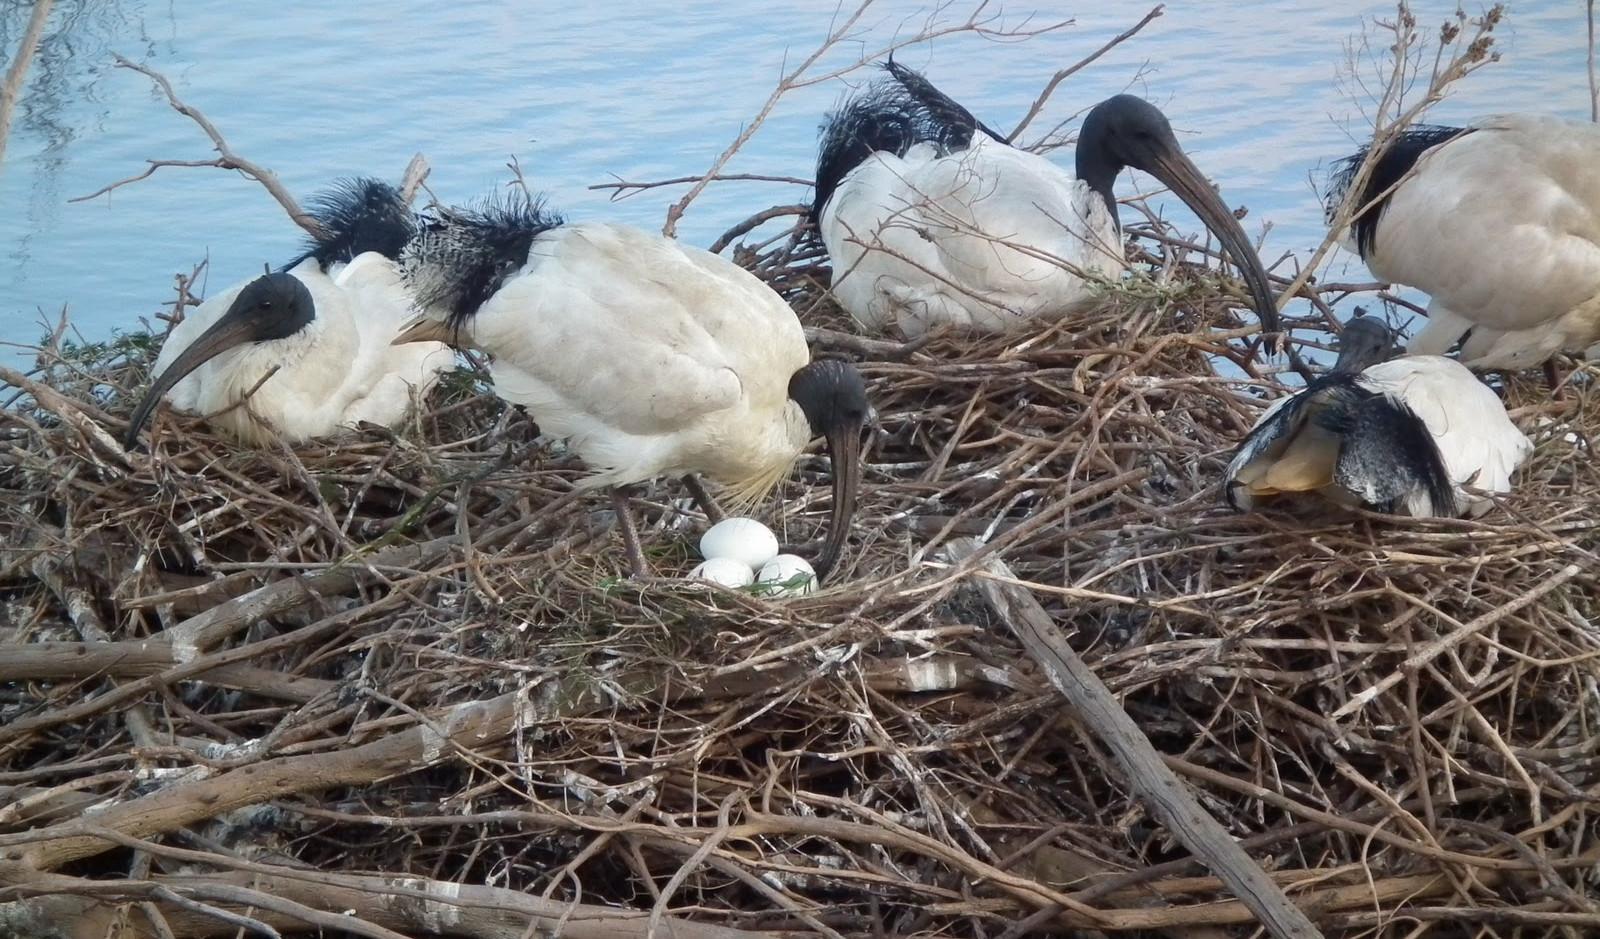 Australian White Ibis nest